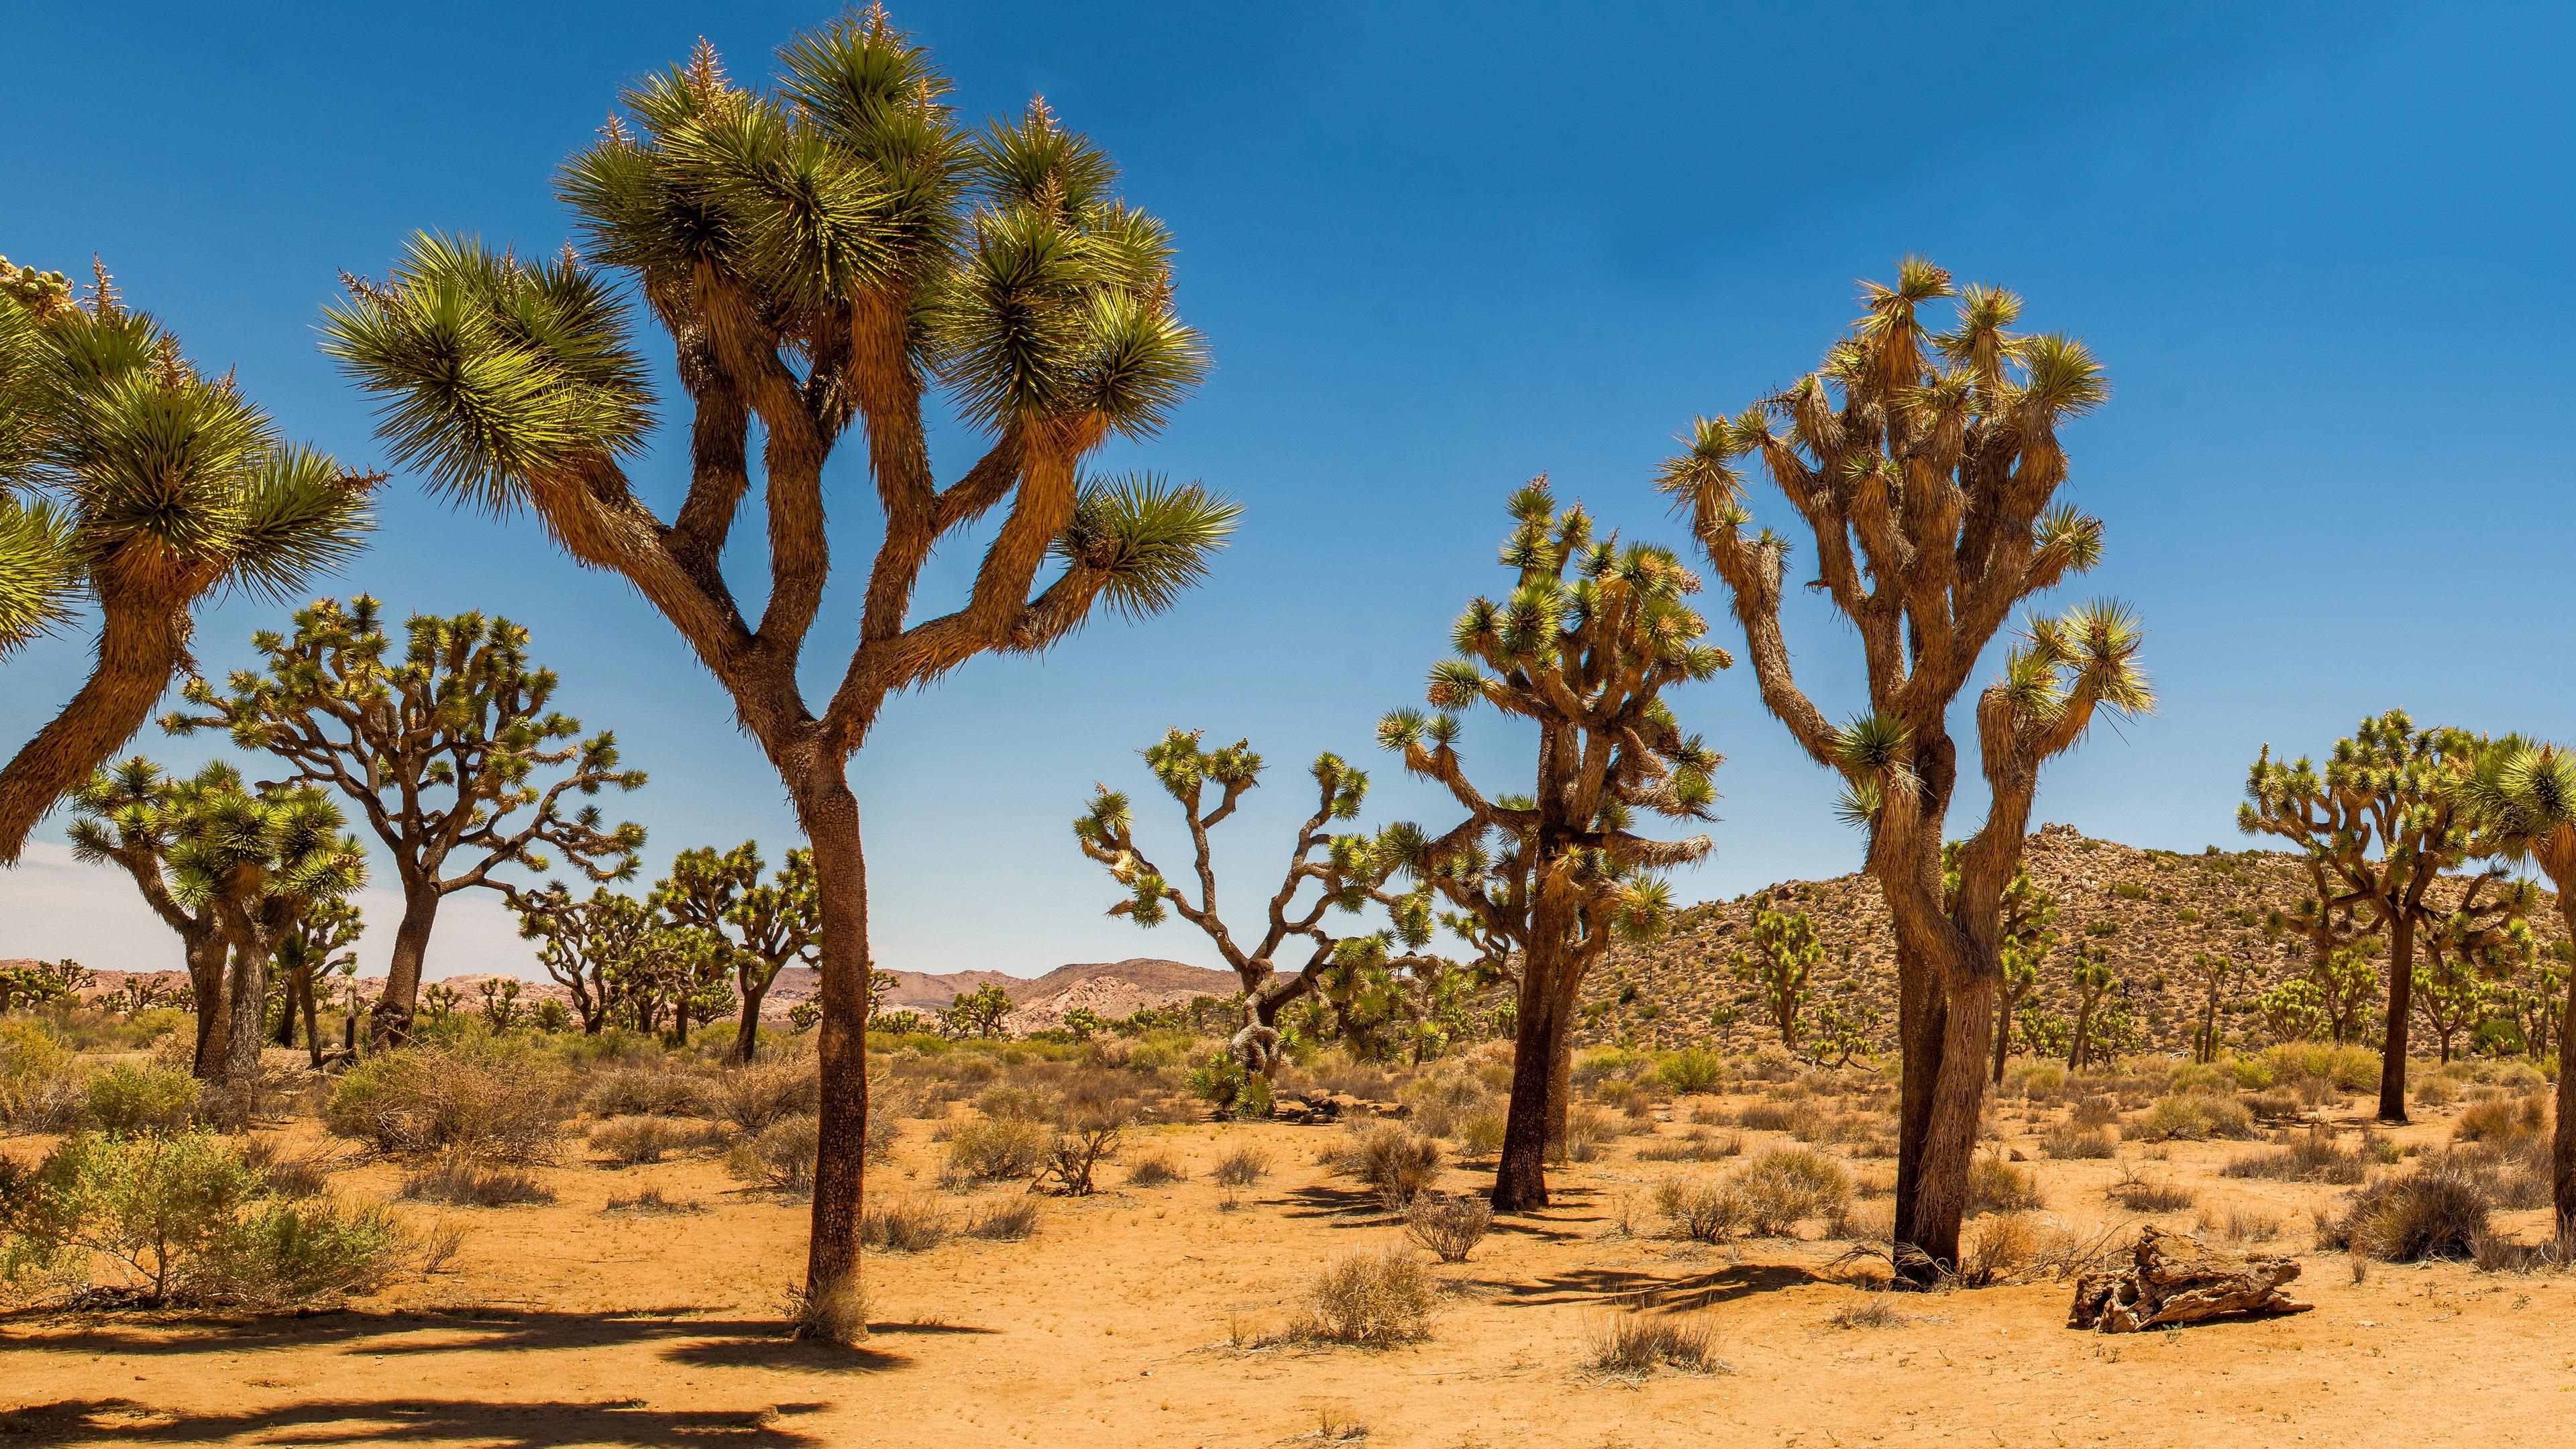 Wallpaper Joshua Tree National Park Usa Desert Shrub Trees Grass 3840x2160 Uhd 4k Picture Image